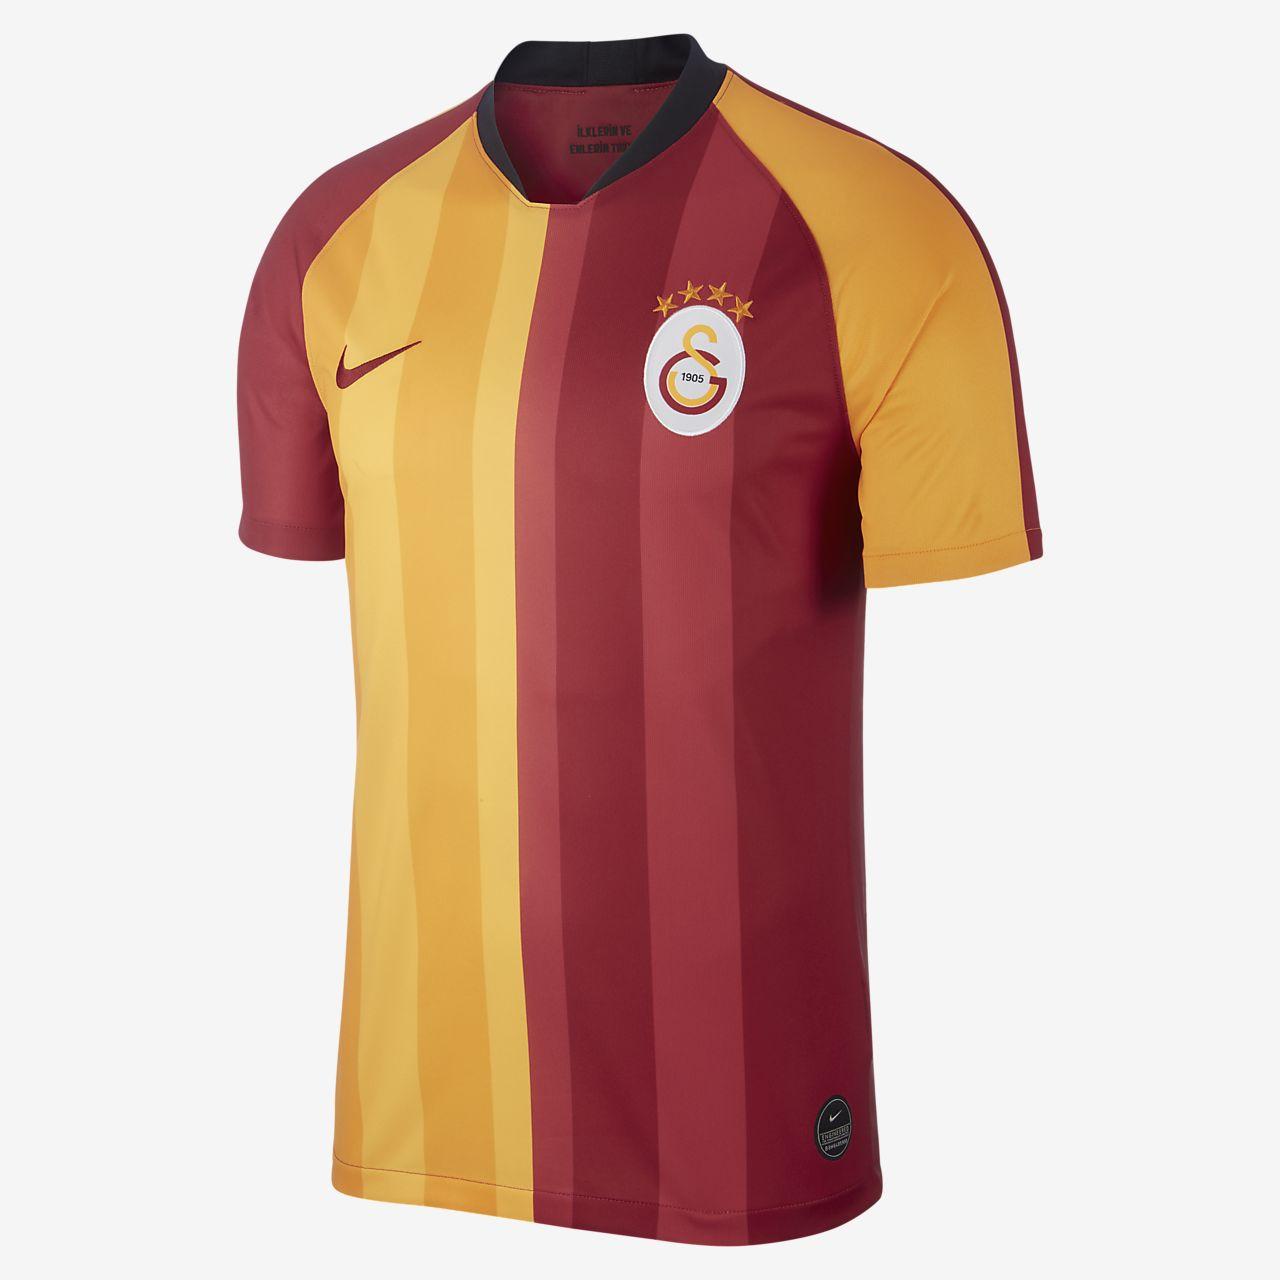 Galatasaray 2019/20 Stadium Home Camiseta de fútbol - Hombre